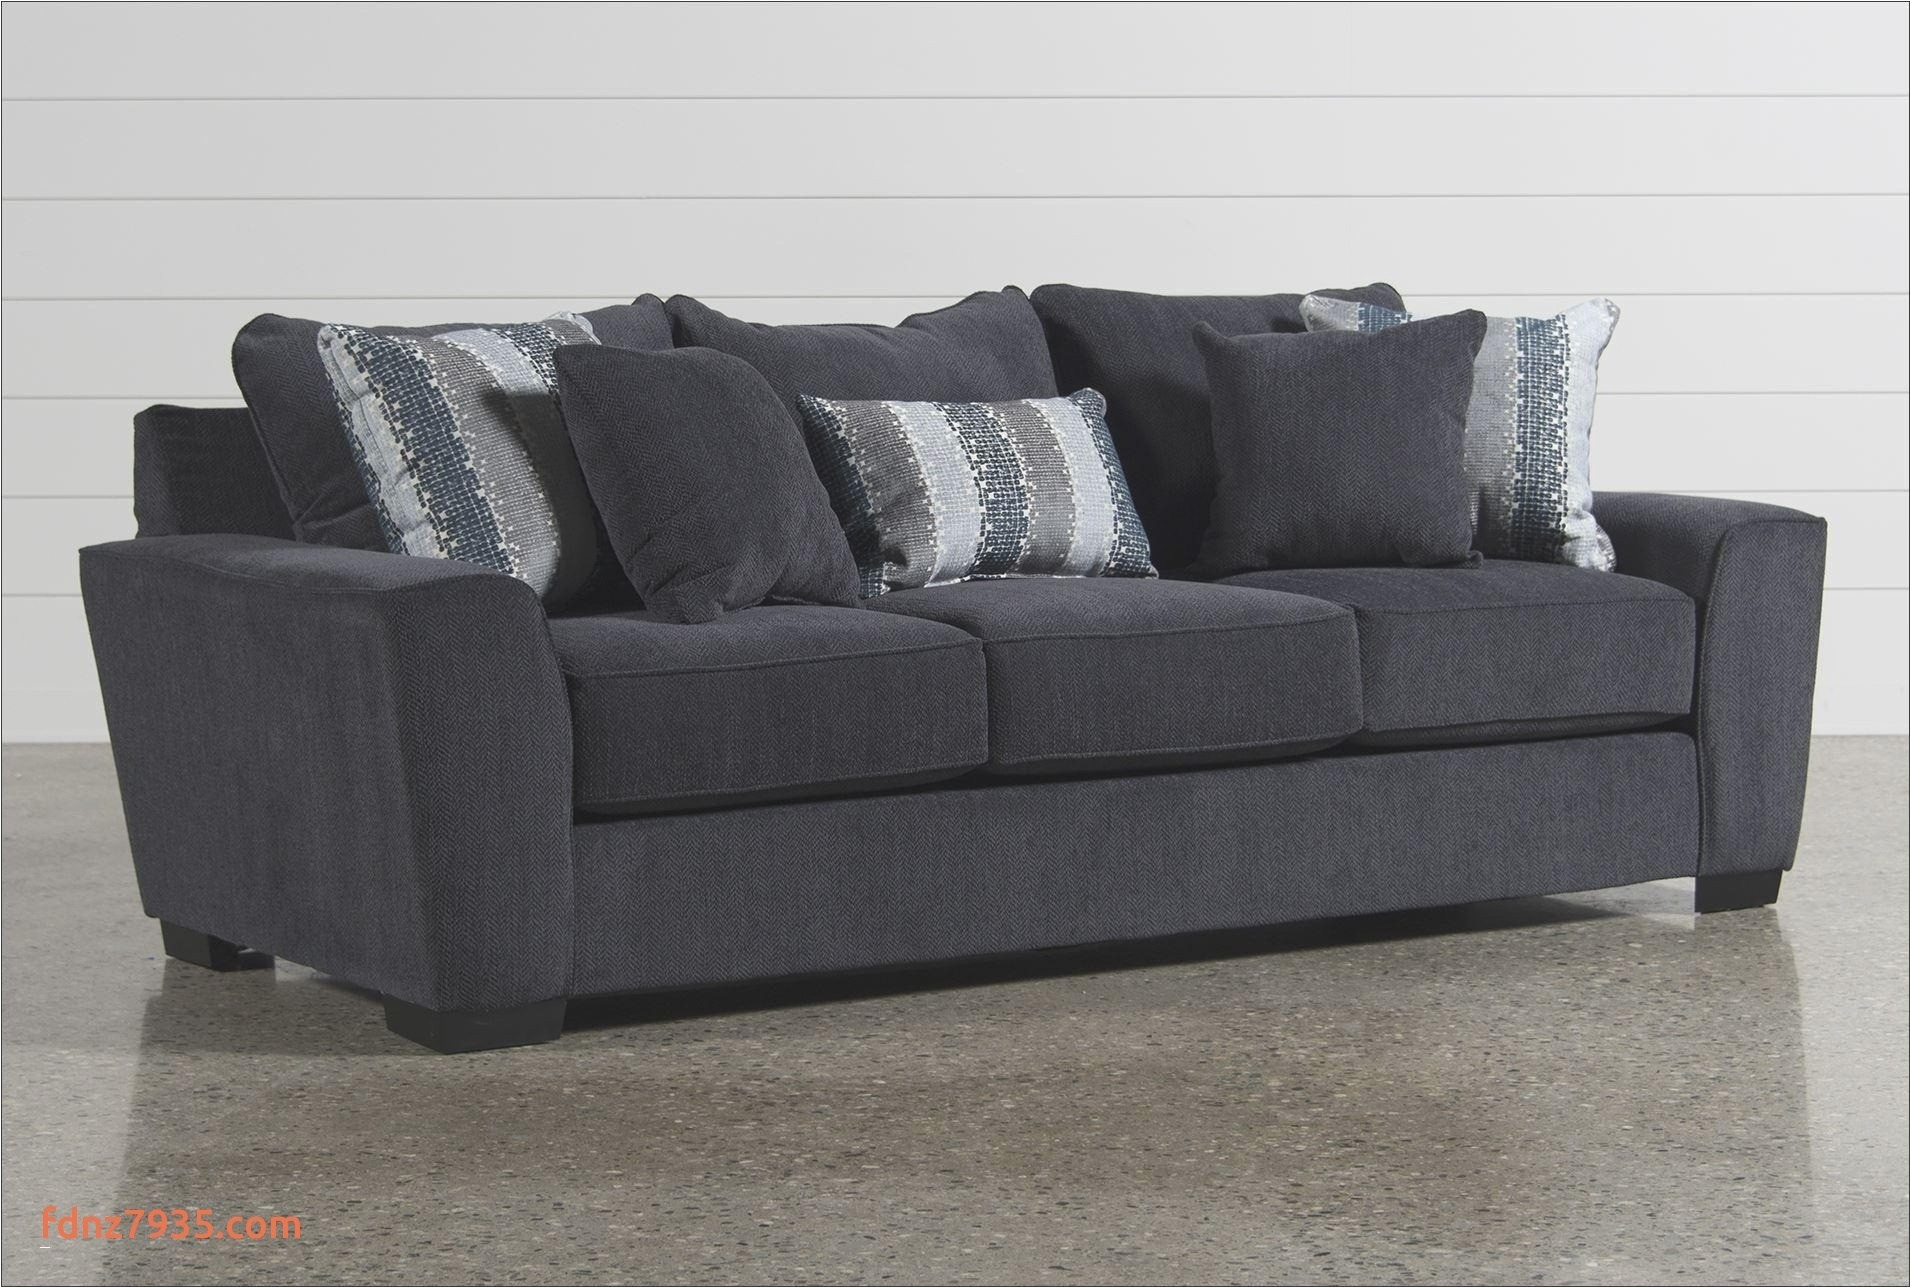 pink sleeper sofa unique beautiful luxury sofa beds home best ideas